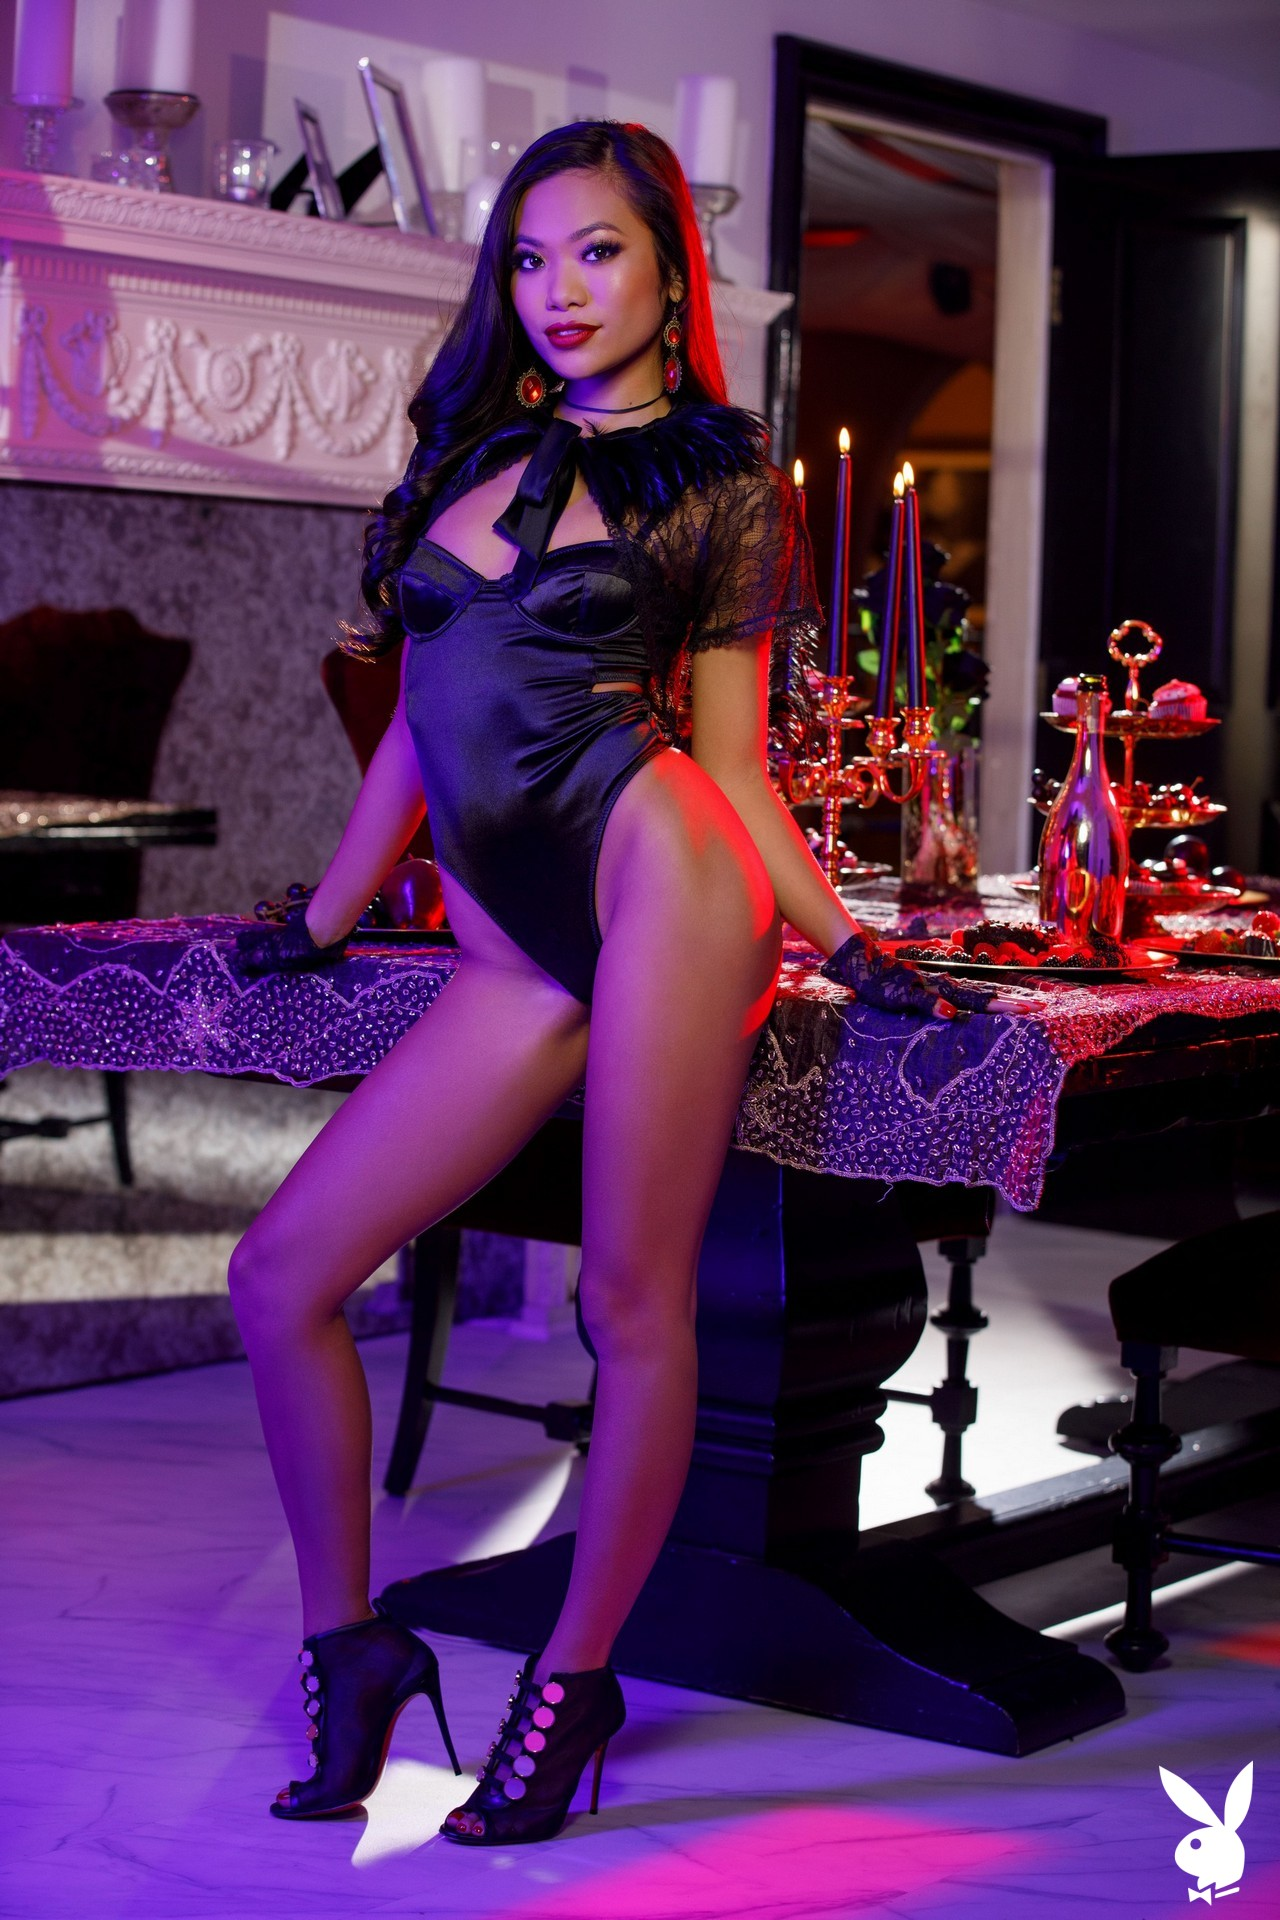 Vina Sky In Midnight Indulgence Playboy Plus (1)